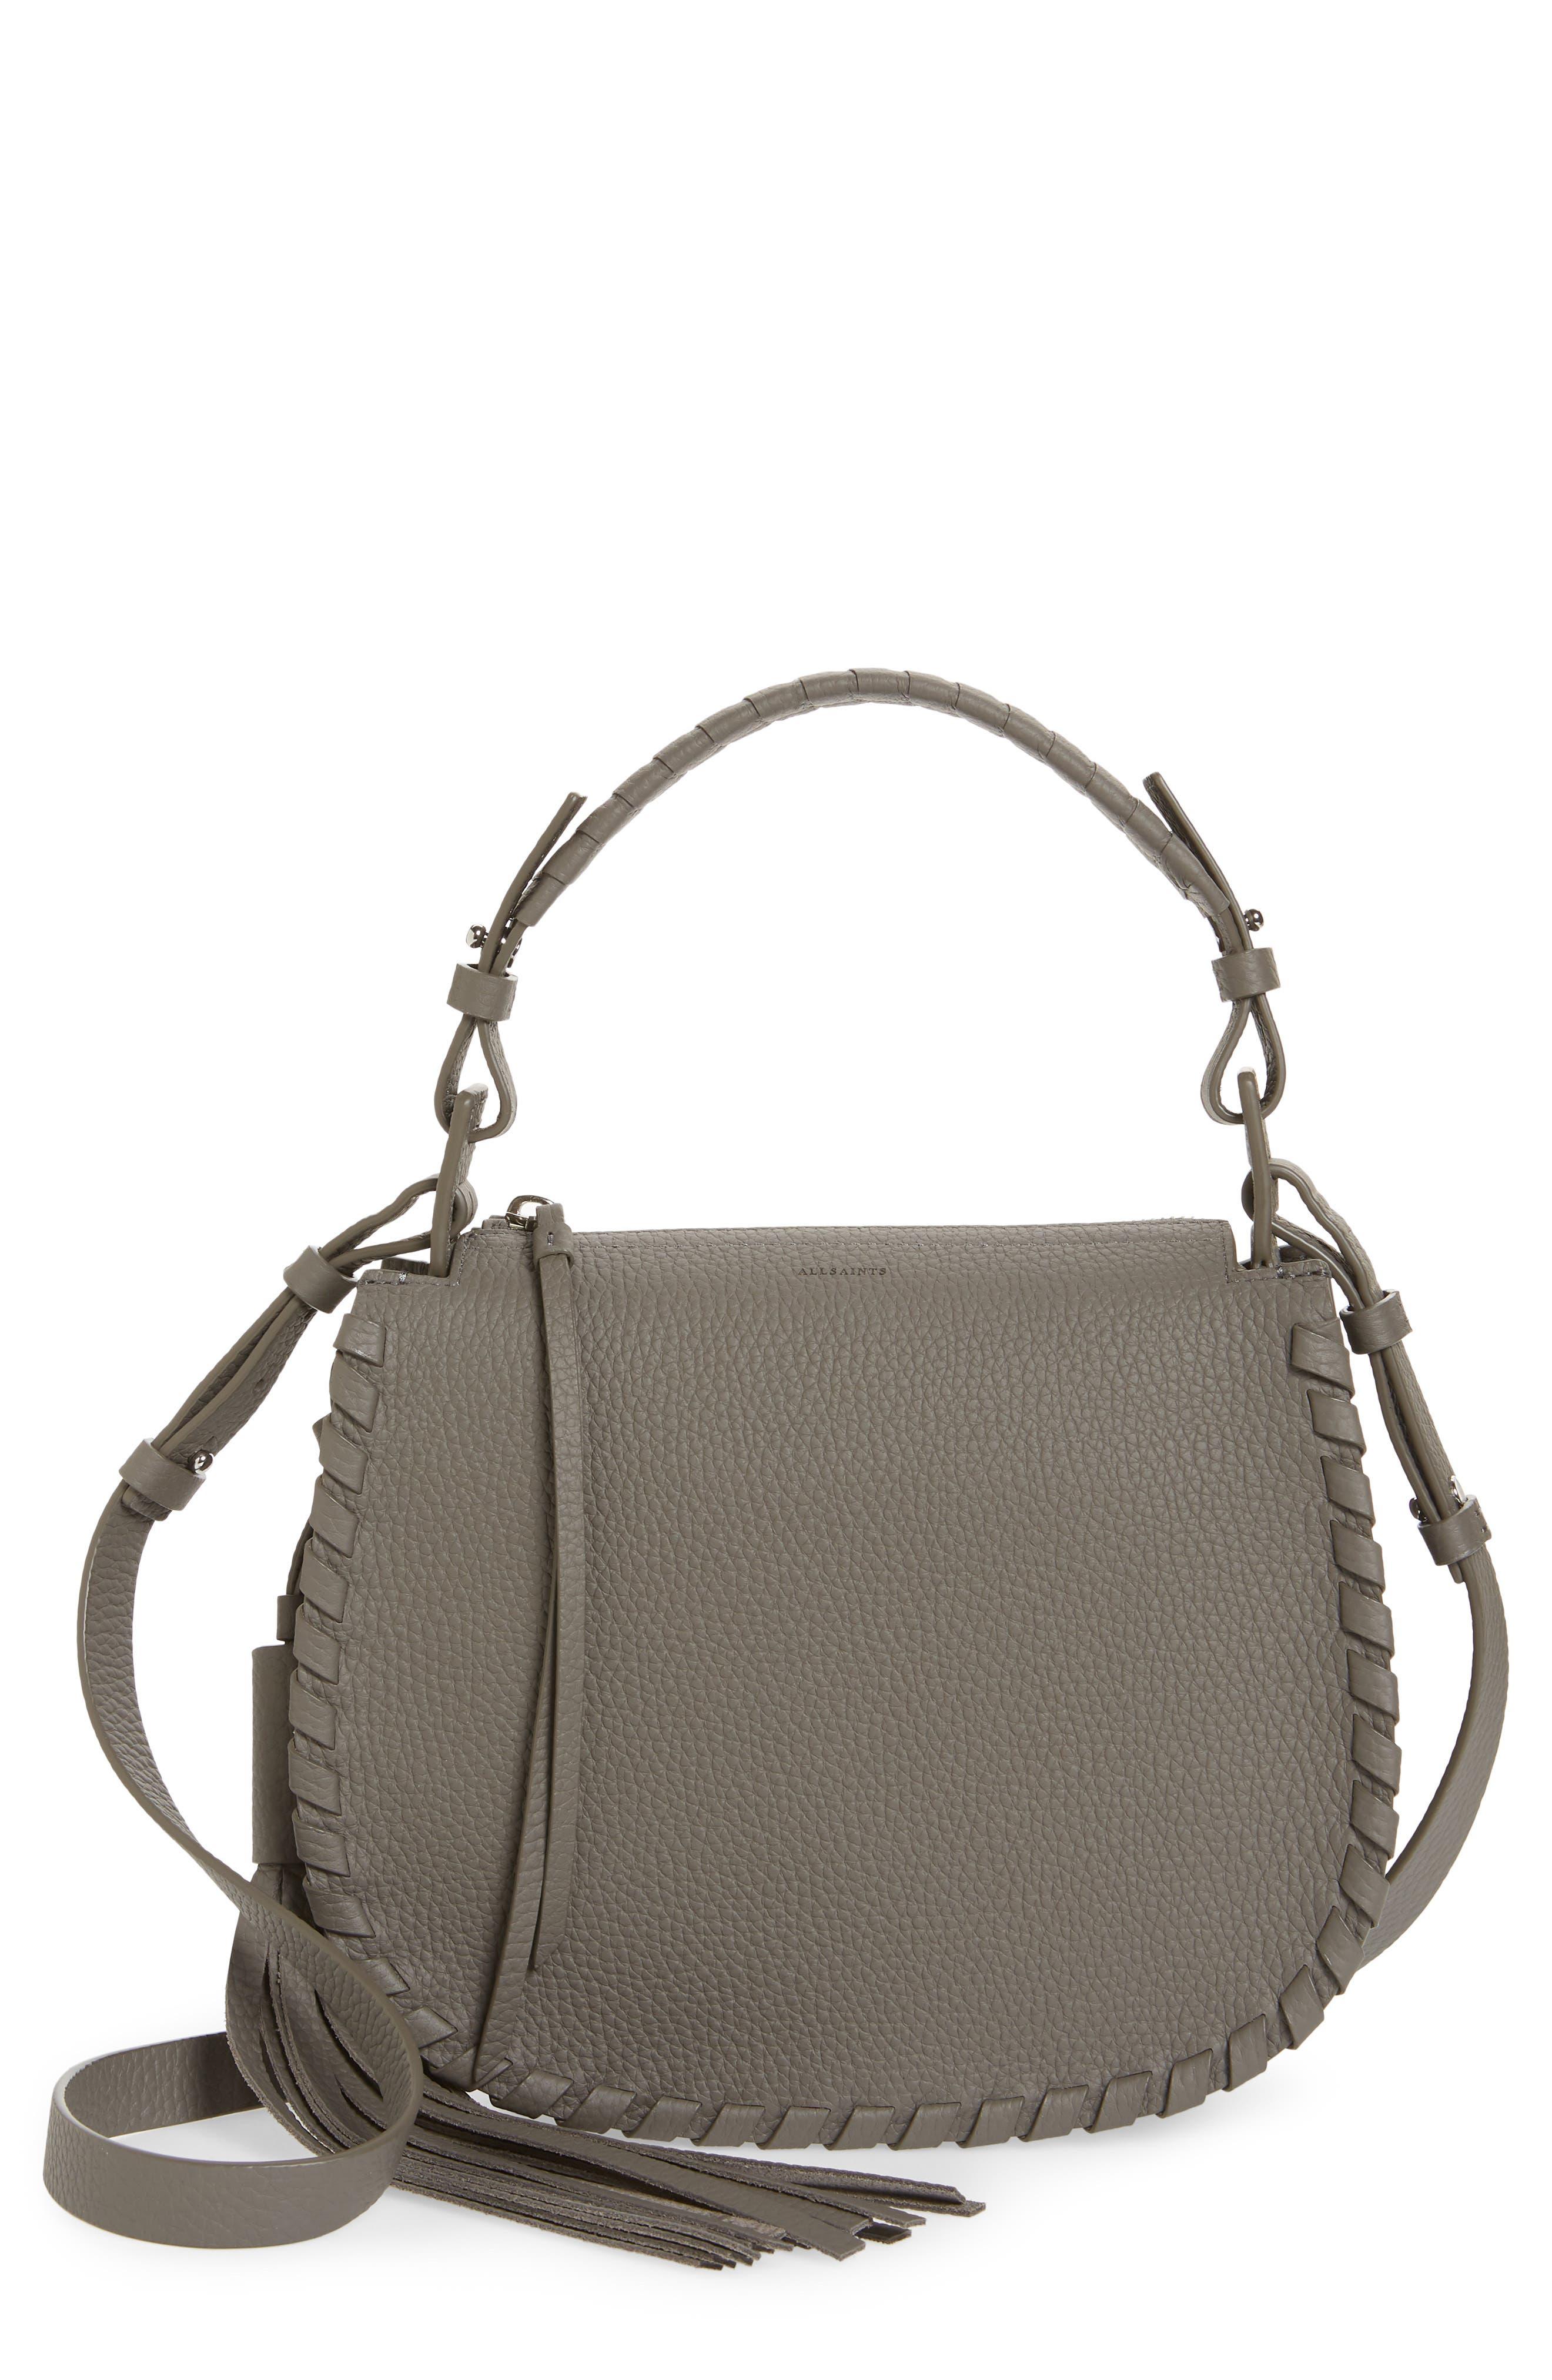 Mori Leather Crossbody Bag,                             Main thumbnail 1, color,                             STORM GREY